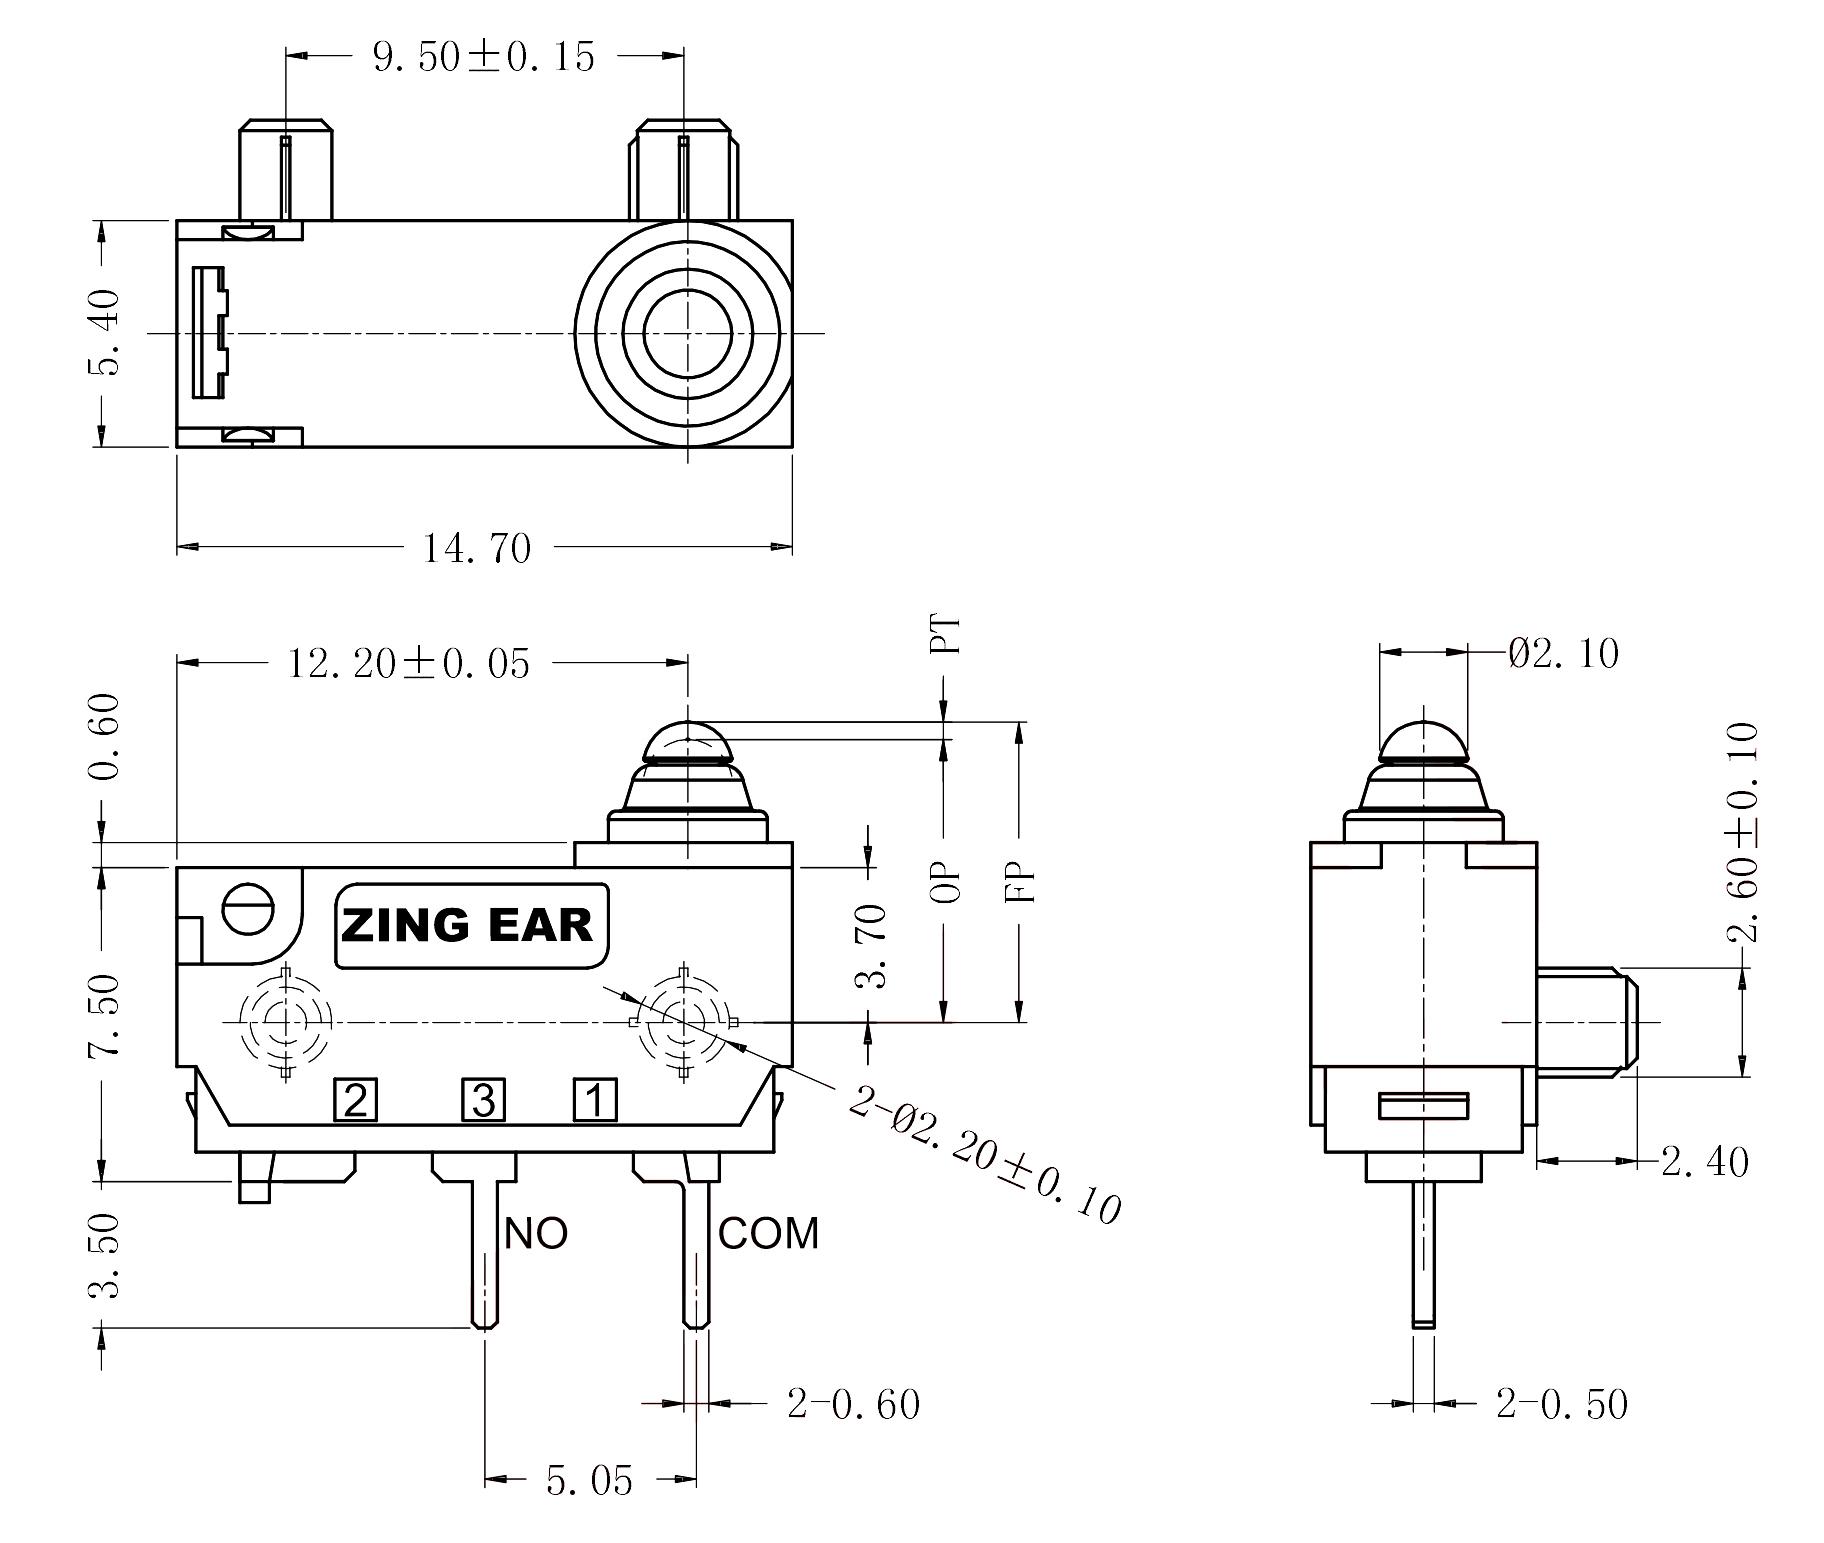 Drawing_G303-130P00C29C_Rev_A0